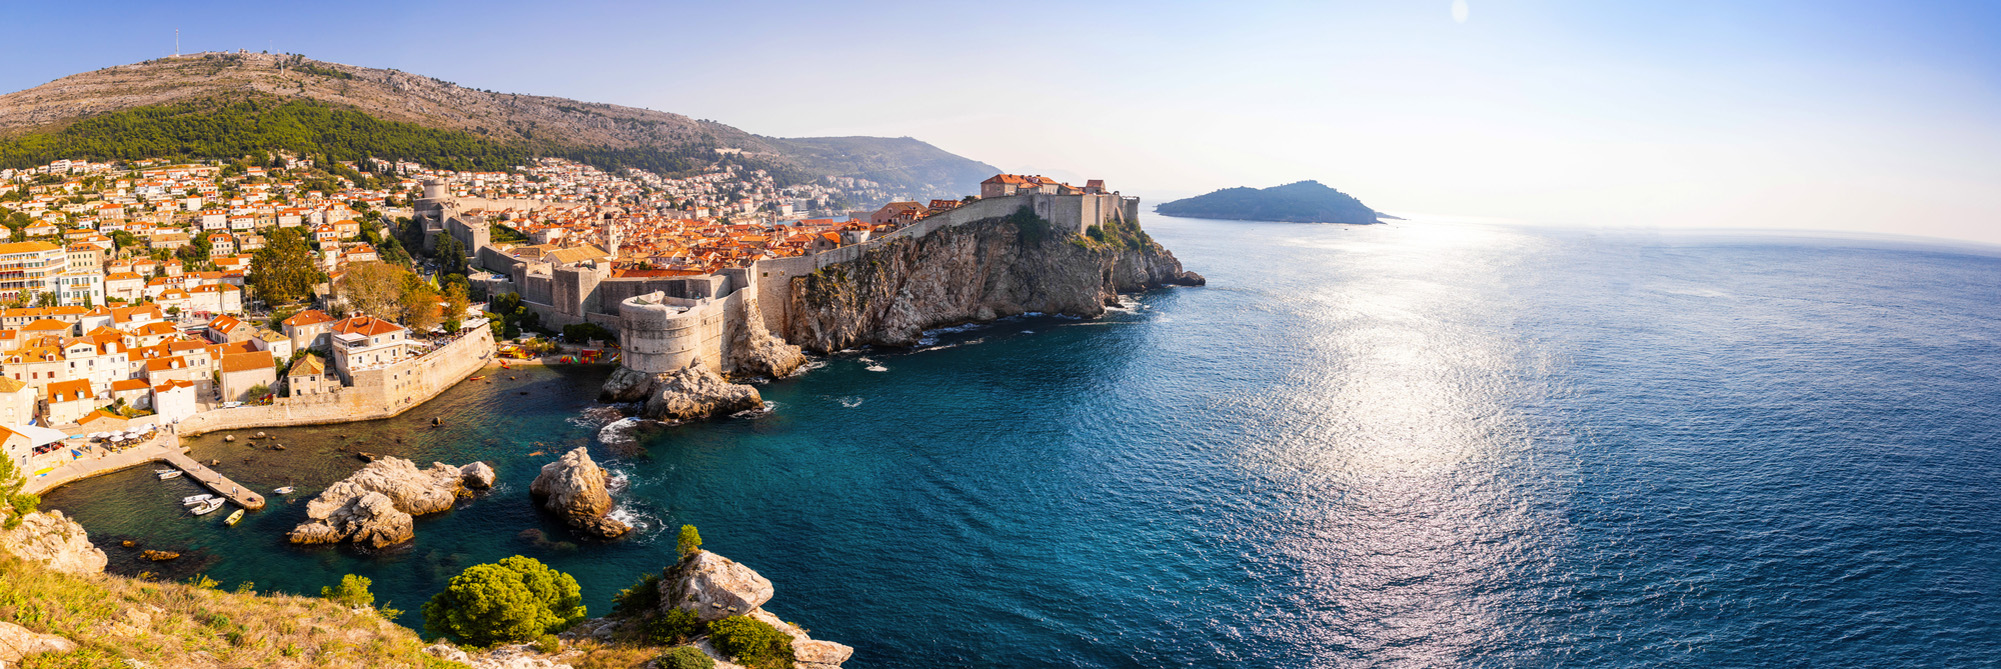 Slider Kroatien Dubrovnik